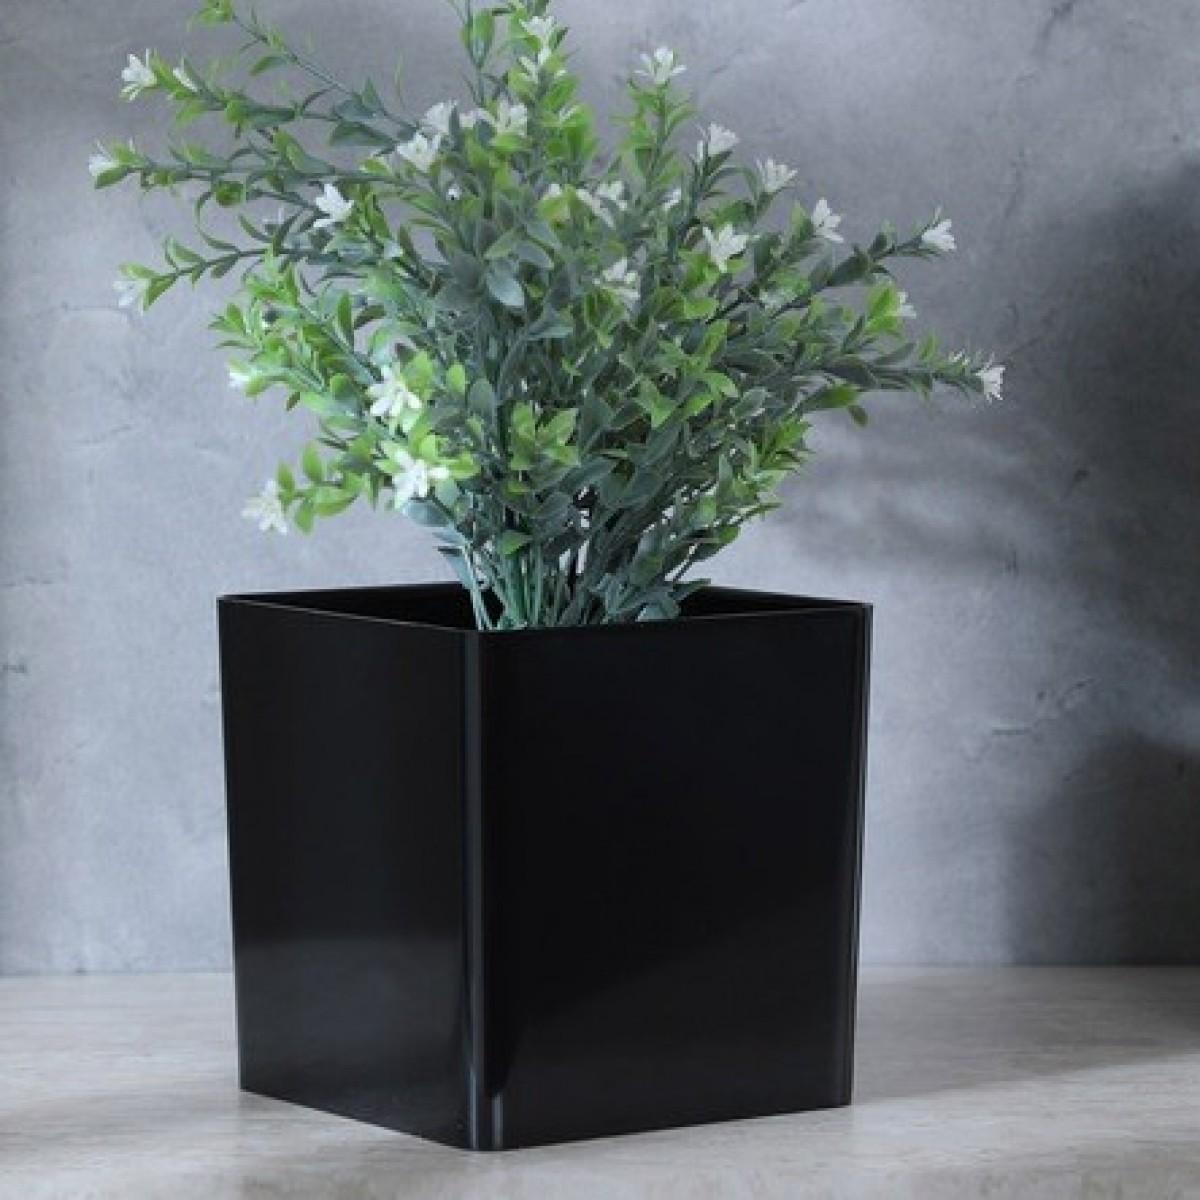 Cube Black 13x13x13cm Acrylic Vase - 1 No